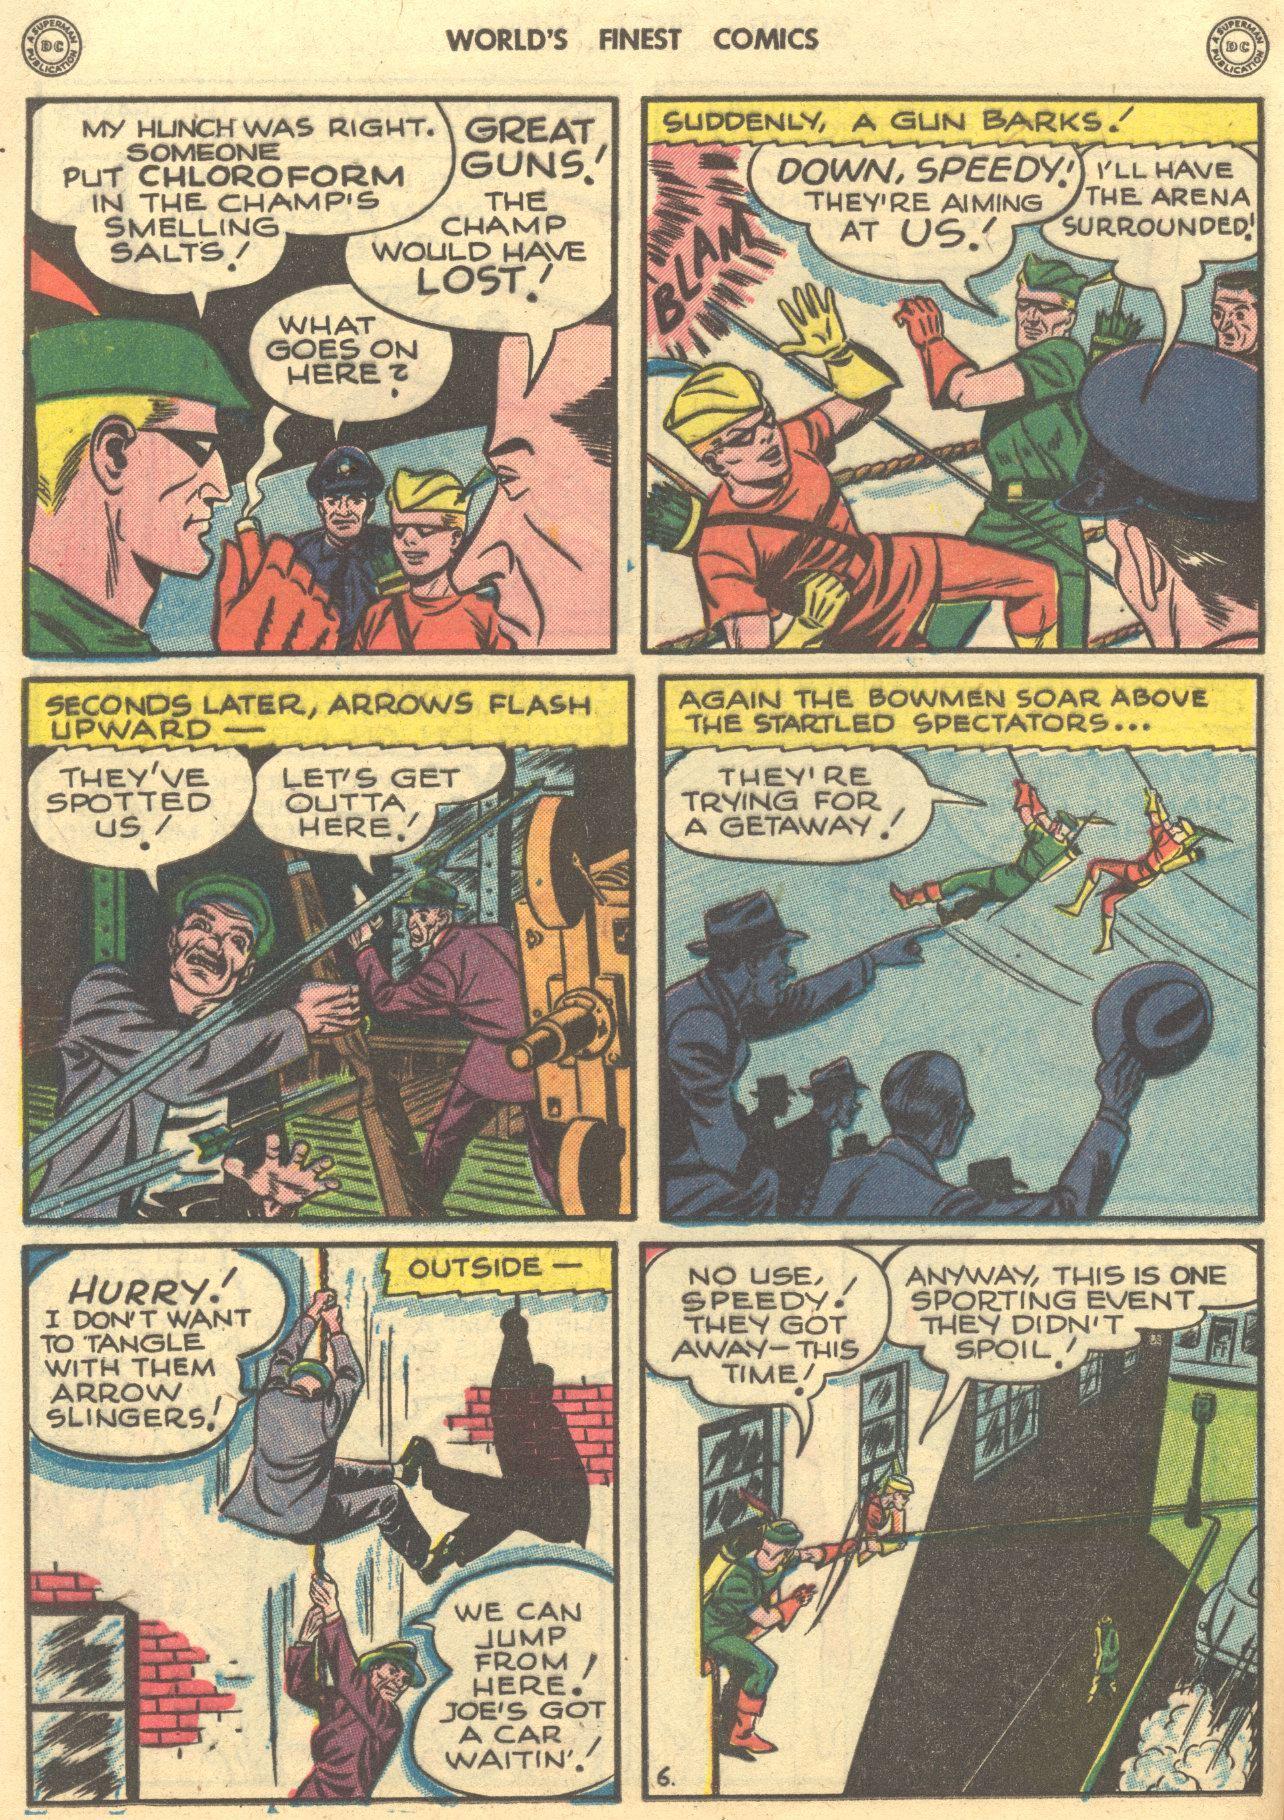 Read online World's Finest Comics comic -  Issue #28 - 21